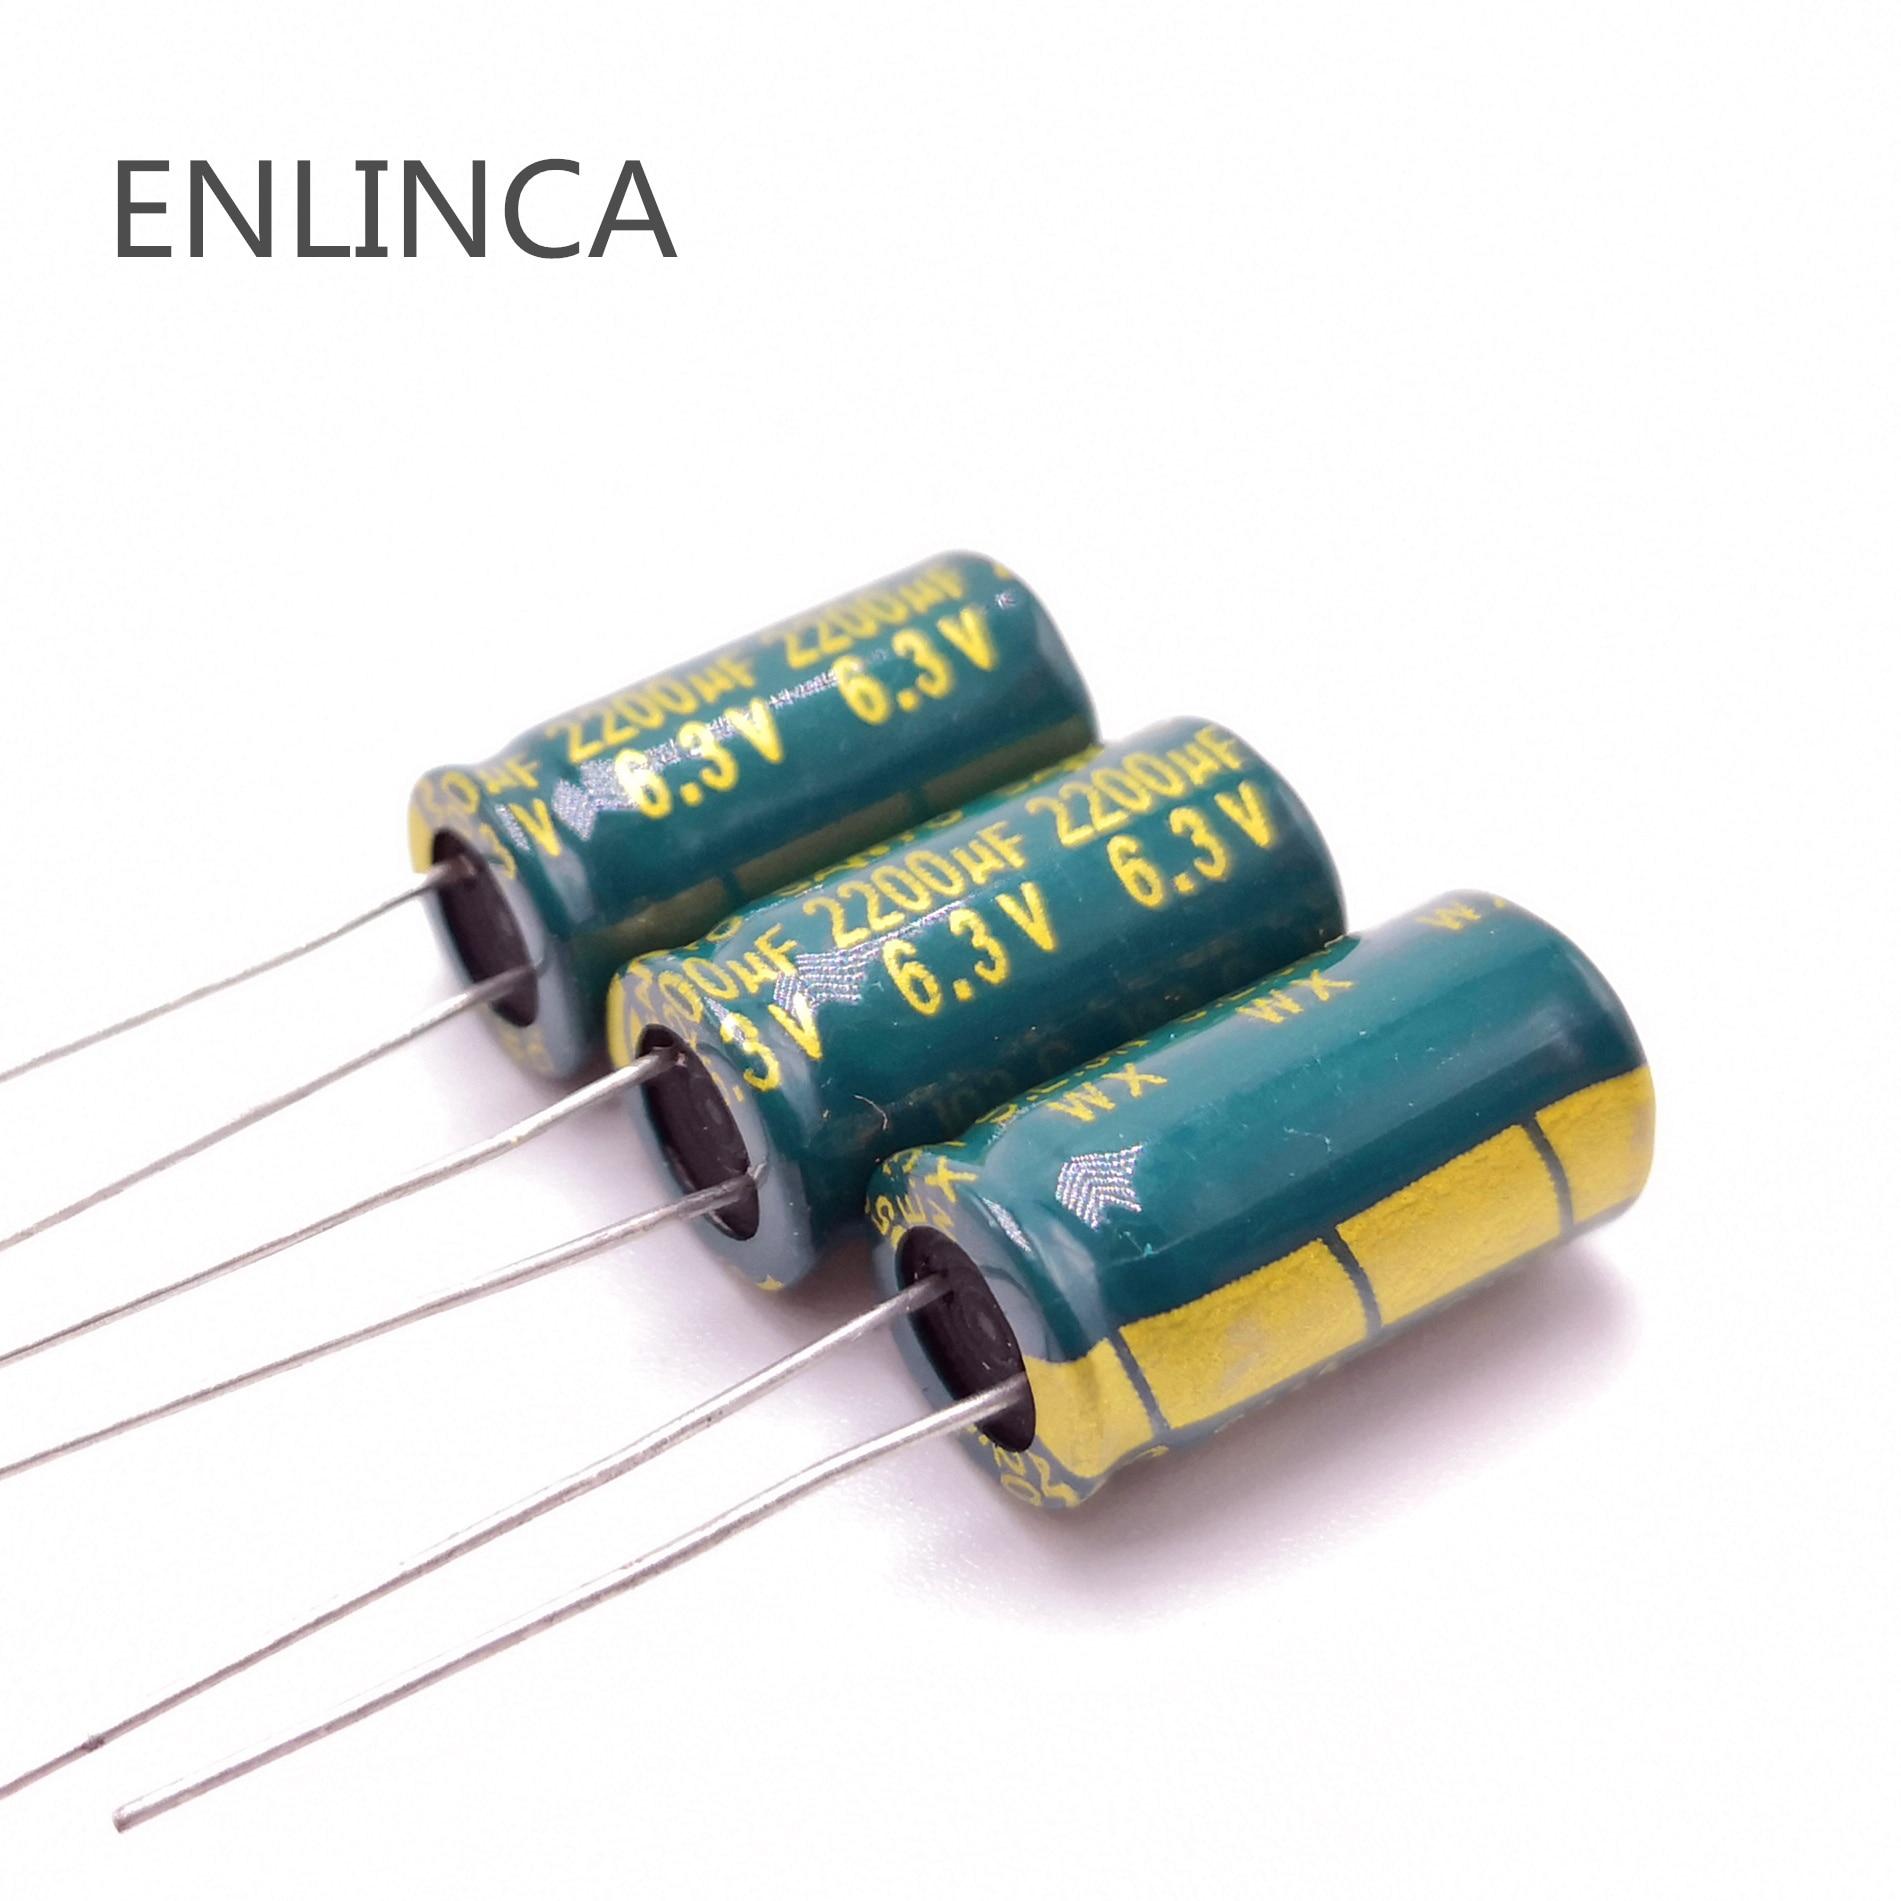 5pcs/lot 6.3v 2200UF 10*16 Low ESR / Impedance High Frequency Aluminum Electrolytic Capacitor 2200UF 6.3v  10*16 6.3v  2200UF